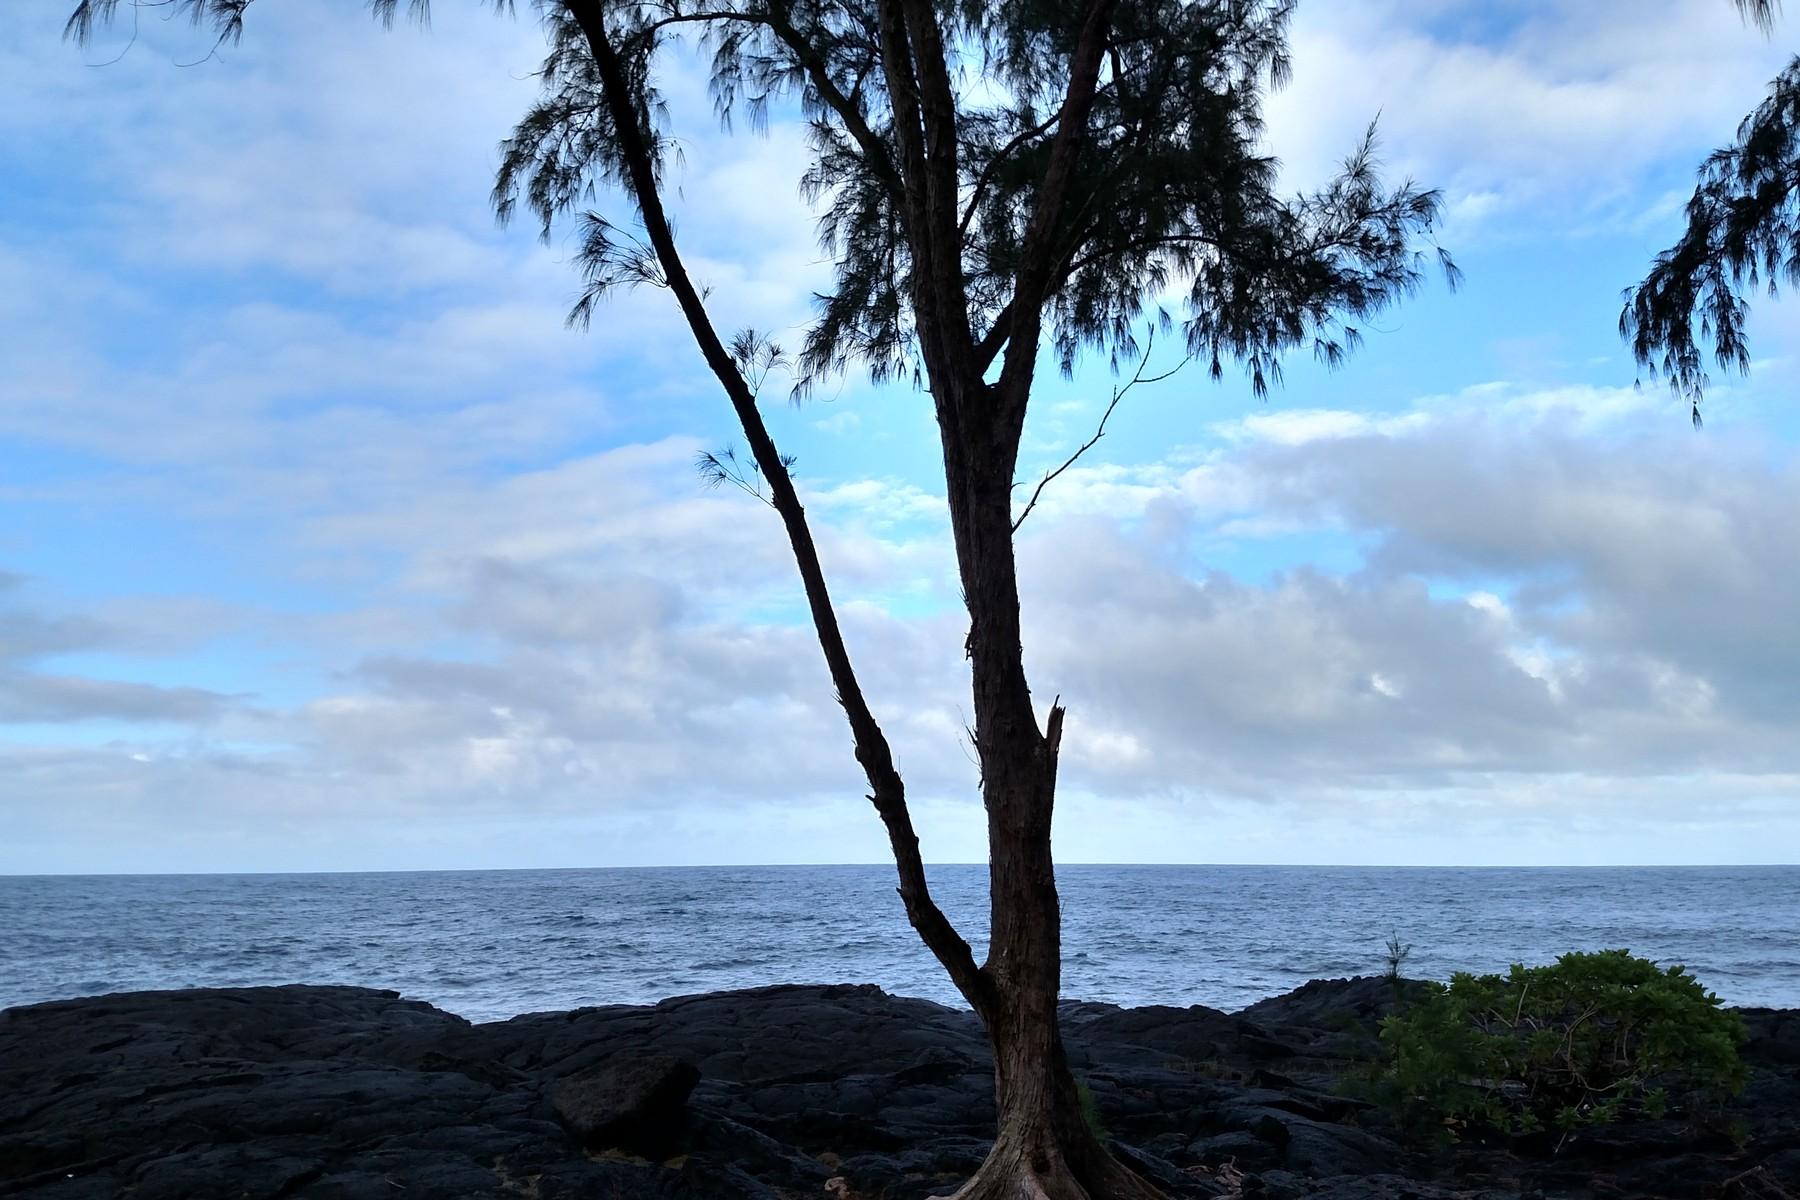 Land for Sale at Hawaiian Paradise Park Ala Heiau Ave, Hawaiian Paradise Park, Keaau, Hawaii, 96749 United States